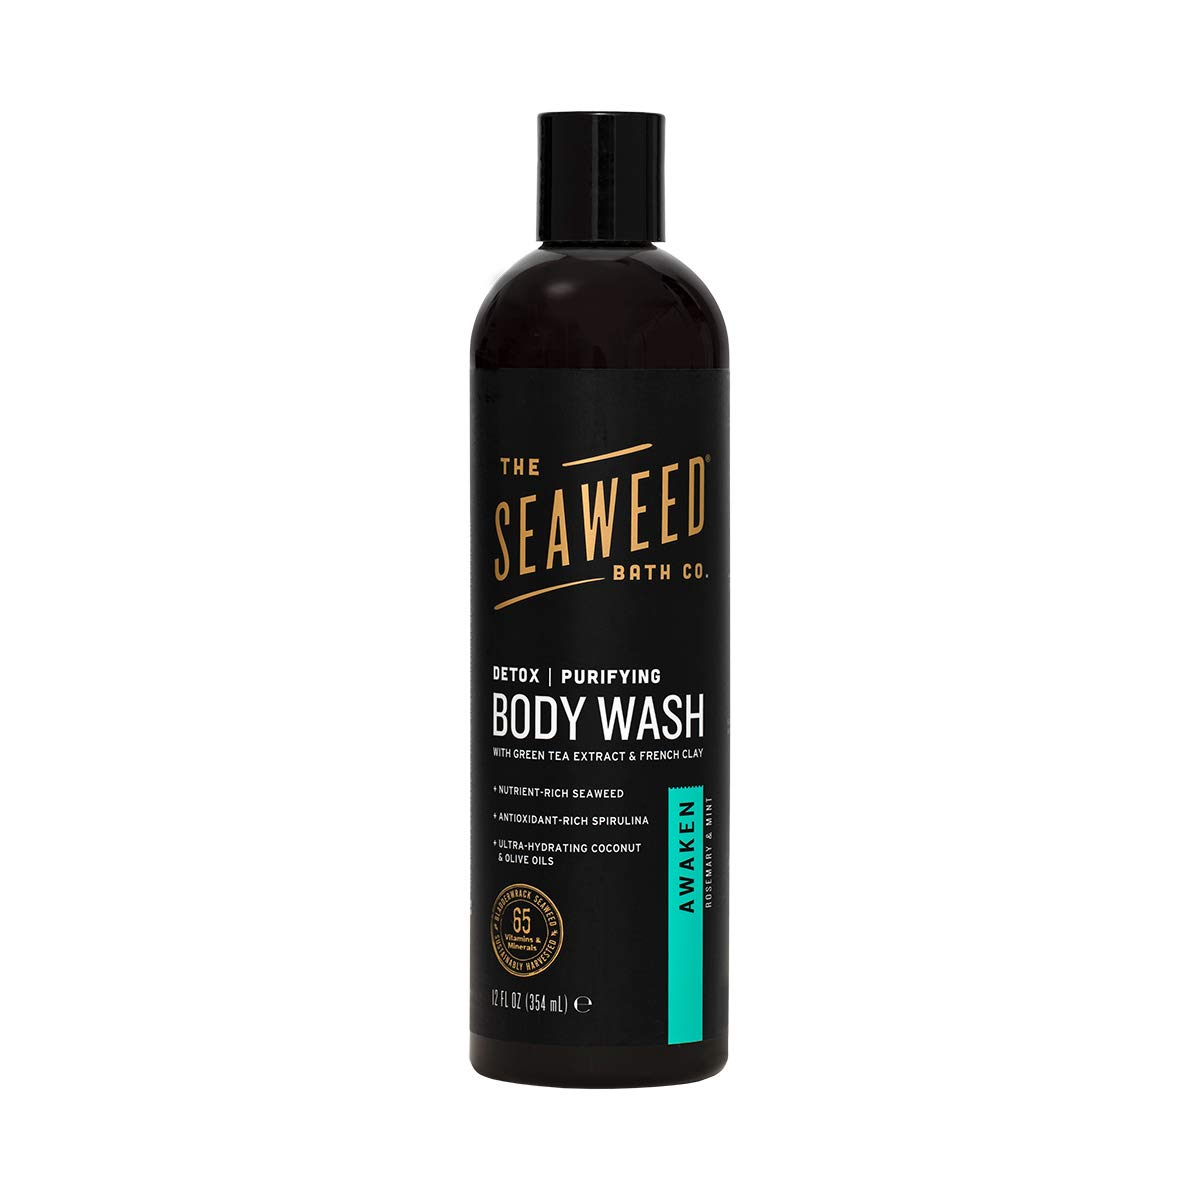 The Seaweed Bath Co. Purifying Detox Body Wash, Awaken Scent (Rosemary and Mint), Natural Organic Seaweed, Vegan, Paraben Free, 12 oz.